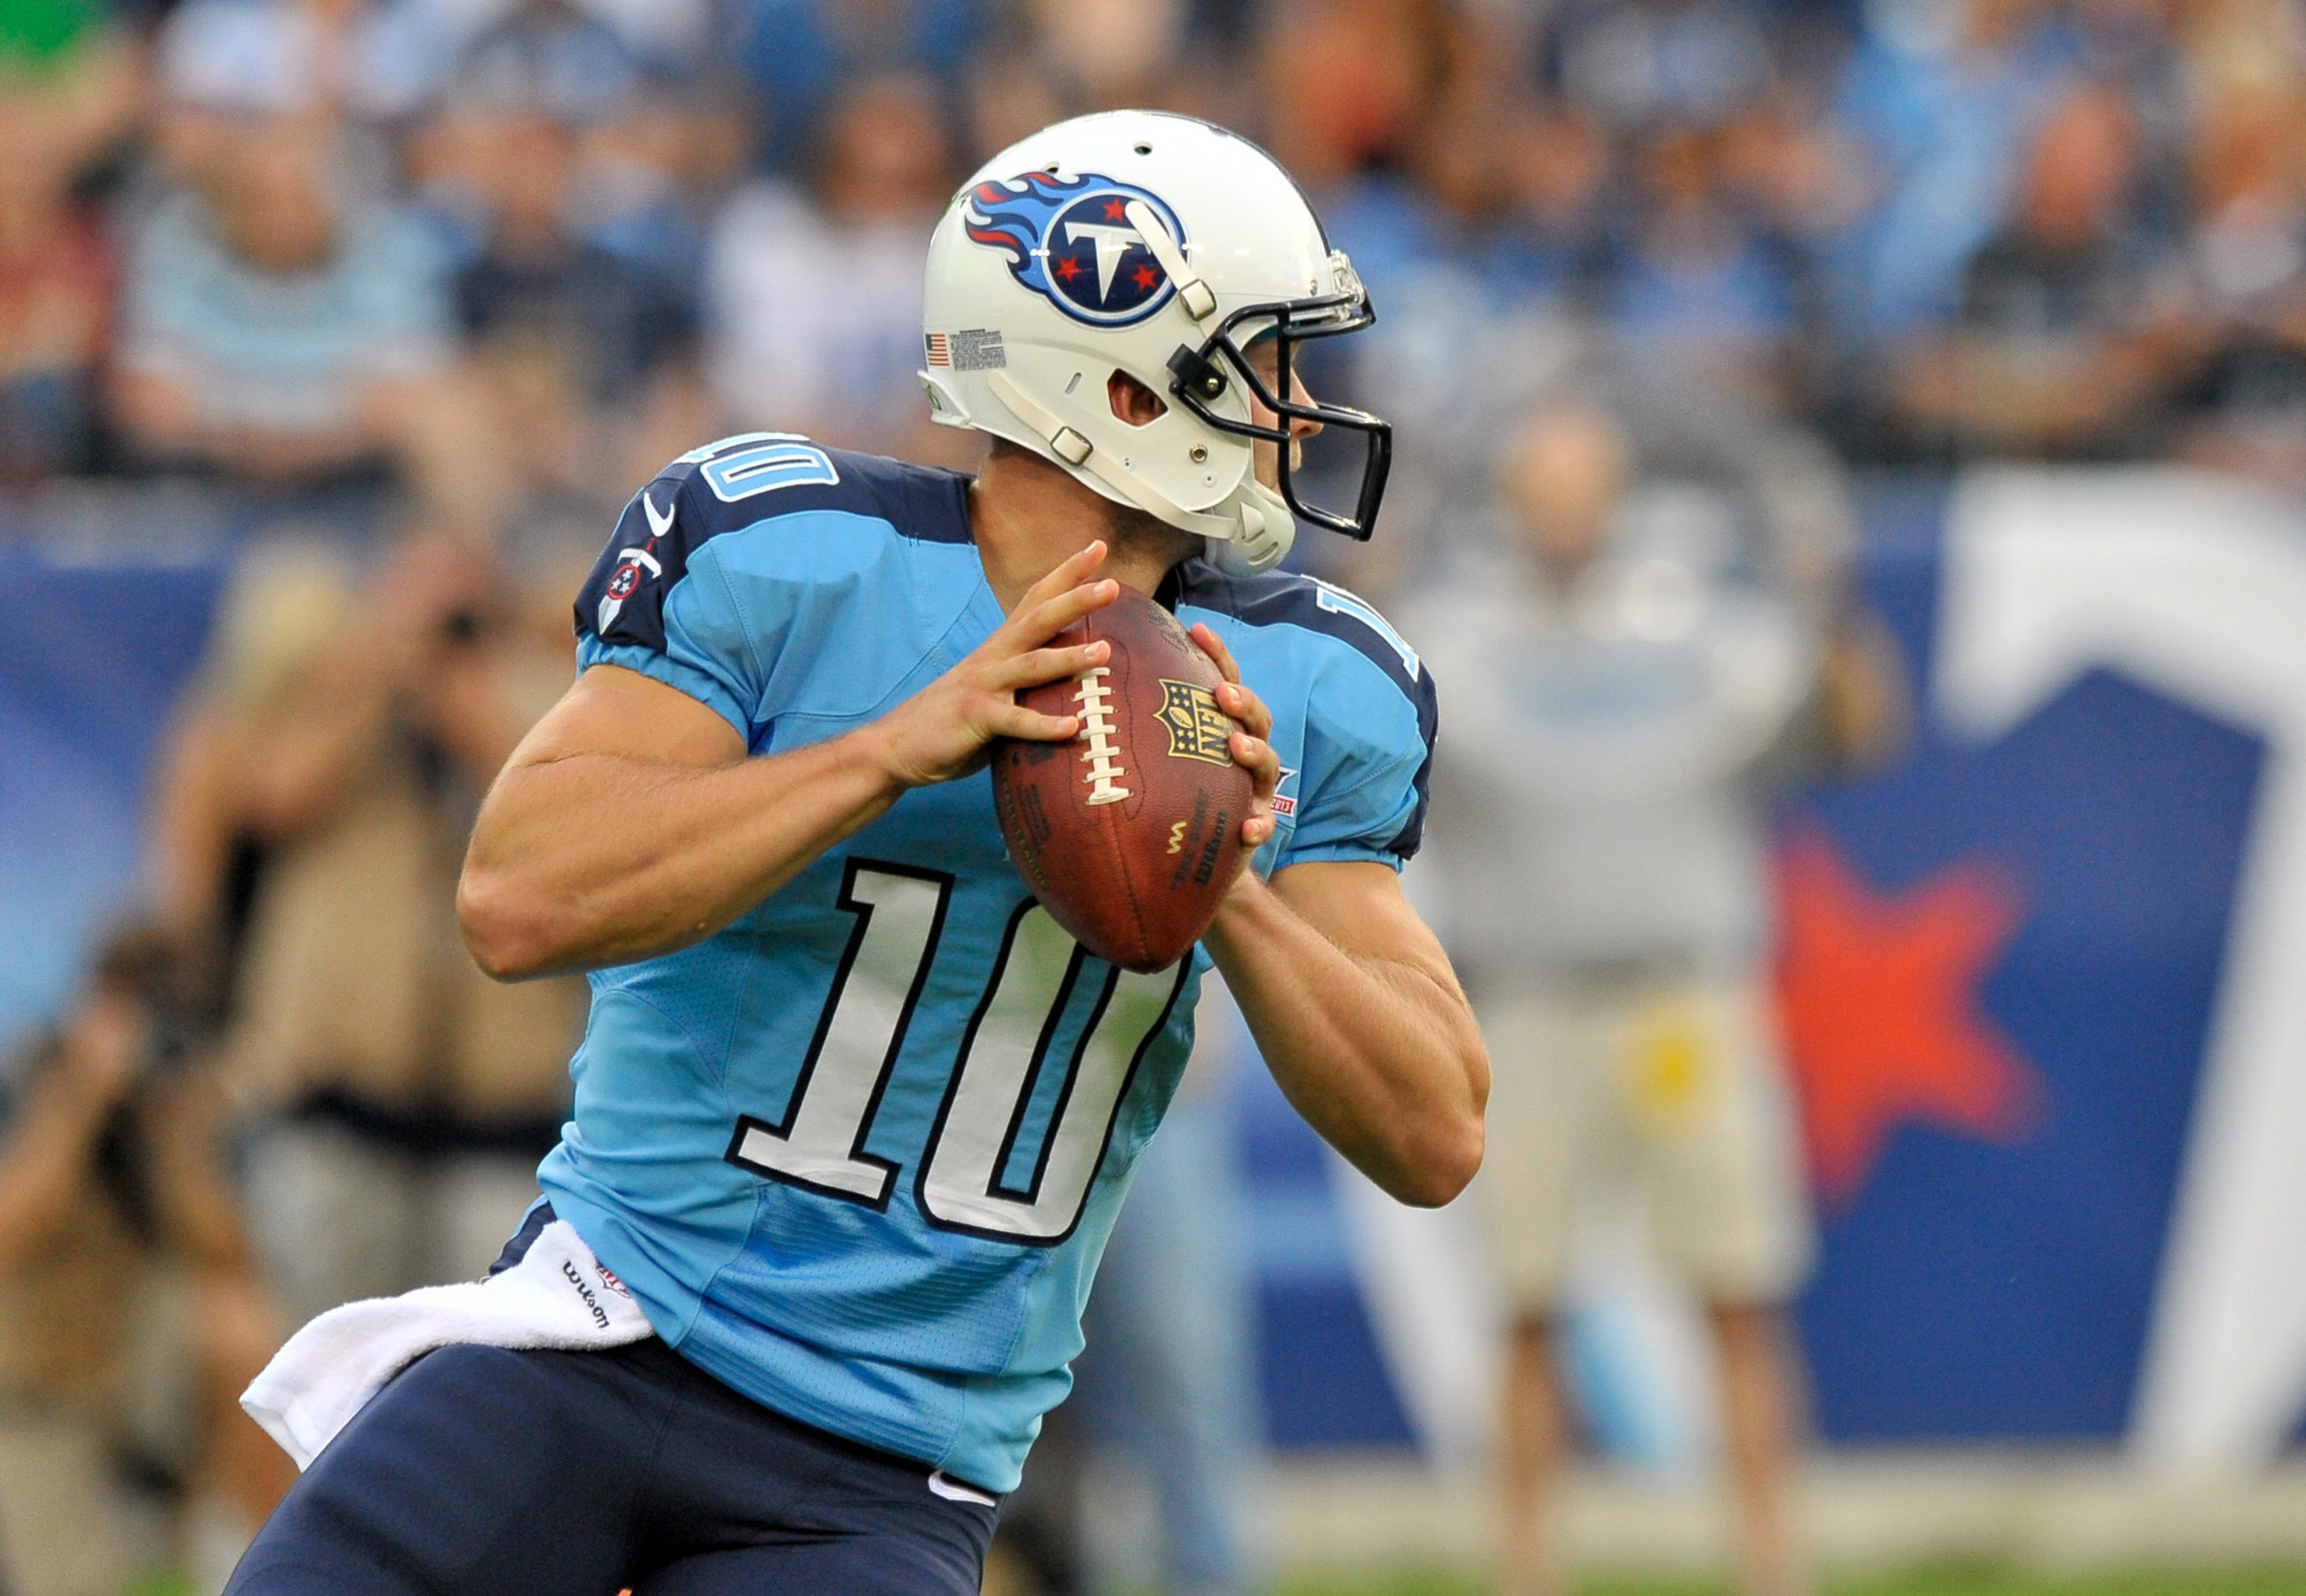 Titans quarterback Jake Locker drops back to throw a pass at LP Field